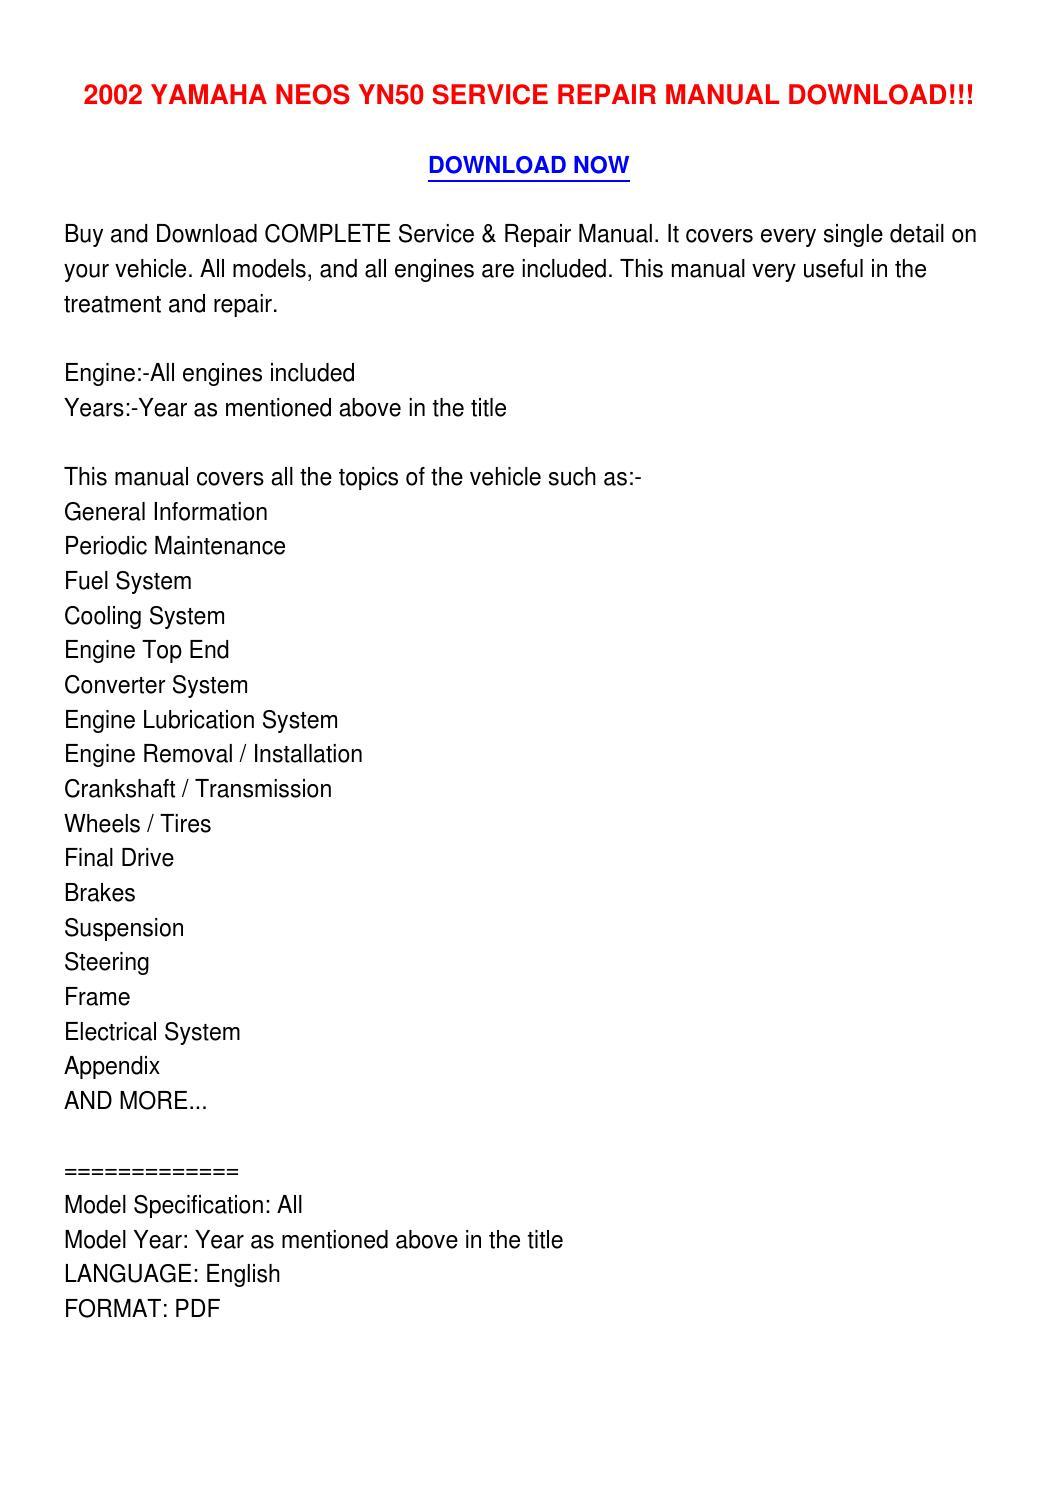 2002 Yamaha Neos Yn50 Service Repair Manual Download    By Leisumispe